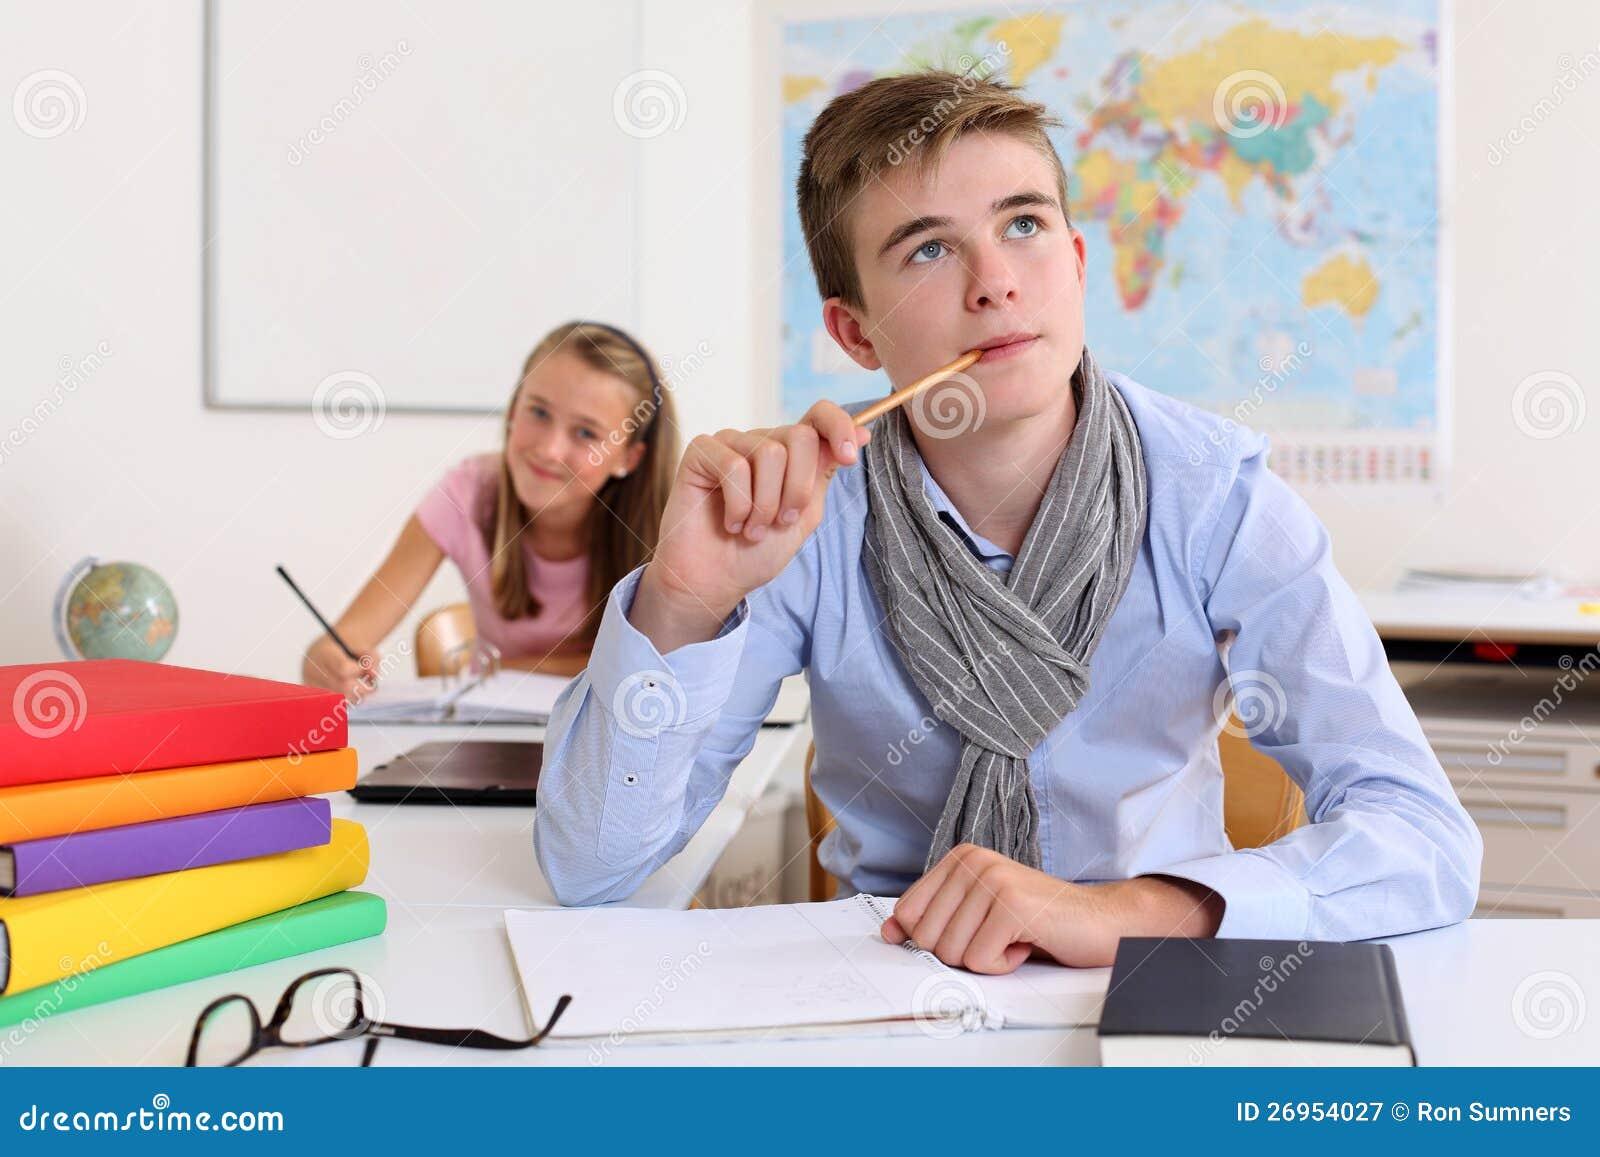 студентка и два студента-лп2